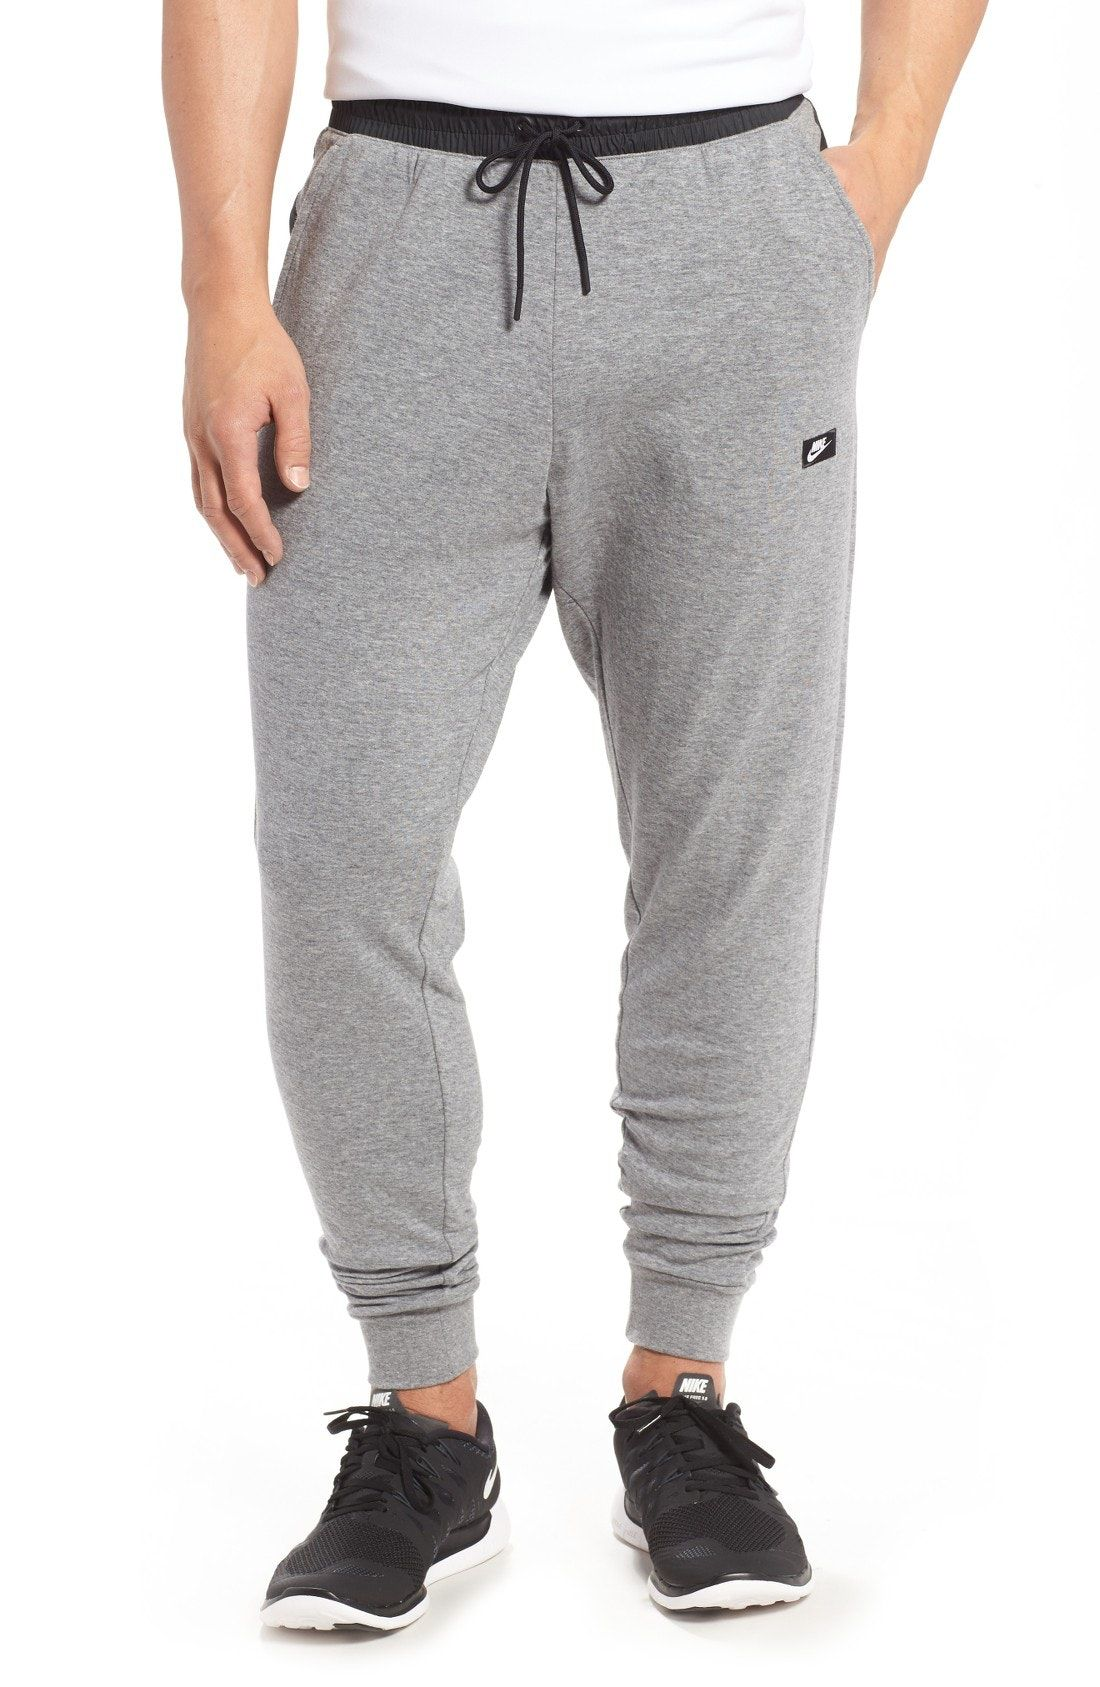 8ae768c01d64 New Nike Modern Jogger Pants